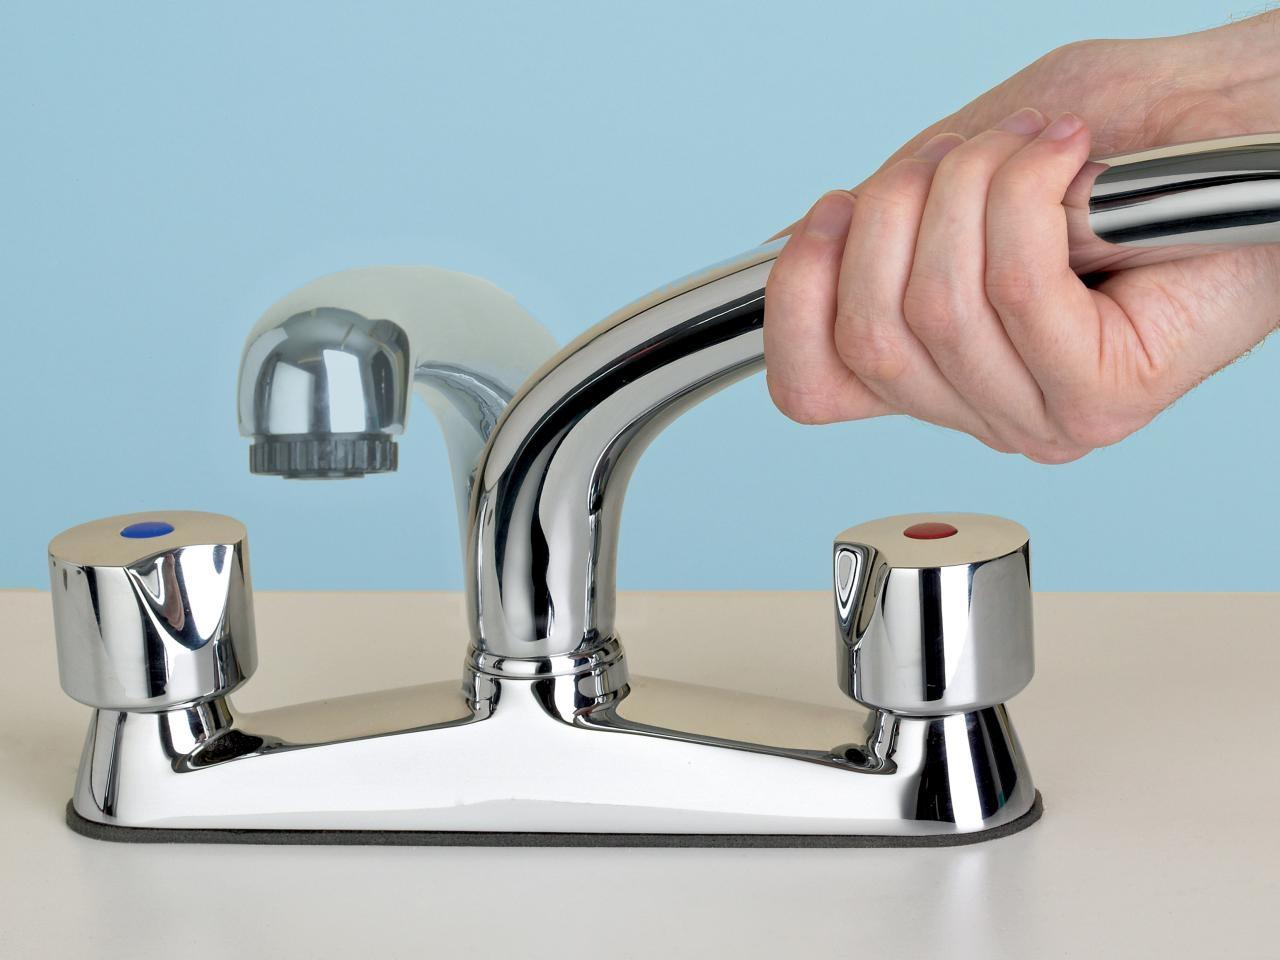 Ideas, bathroom excellent old bathtub faucet parts 57 rx dk diy remove within proportions 1280 x 960  .